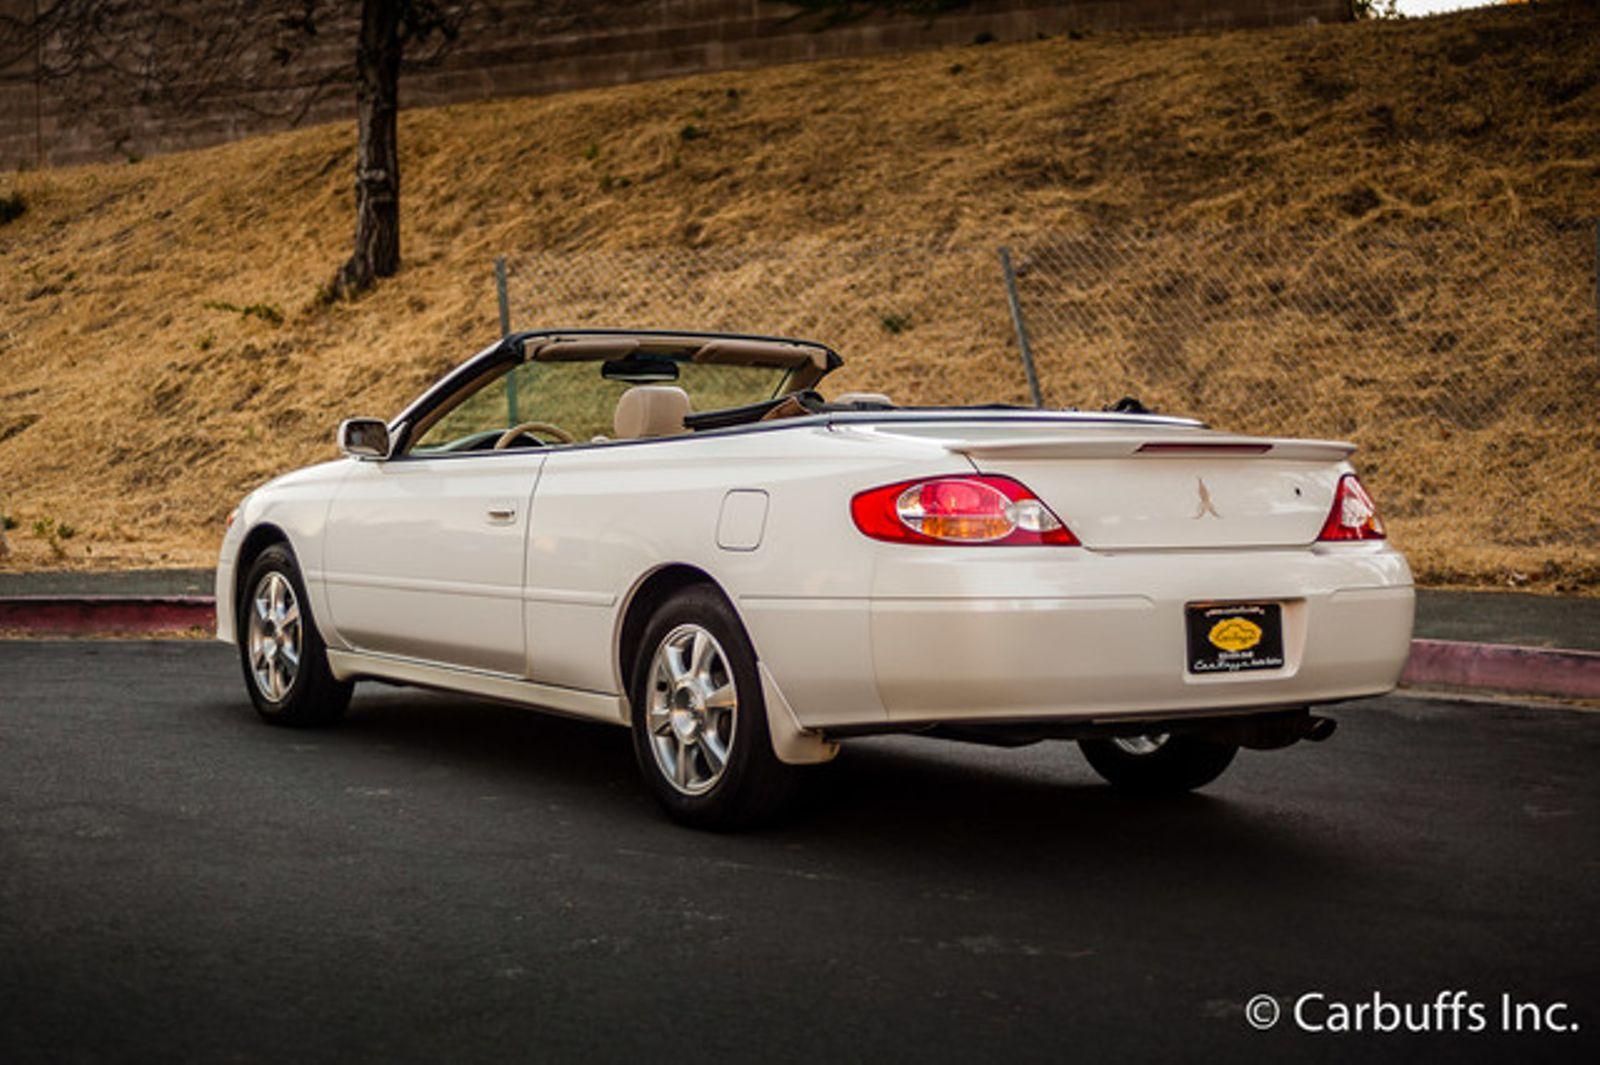 2002 Toyota Camry Solara Sle Concord Ca Carbuffs